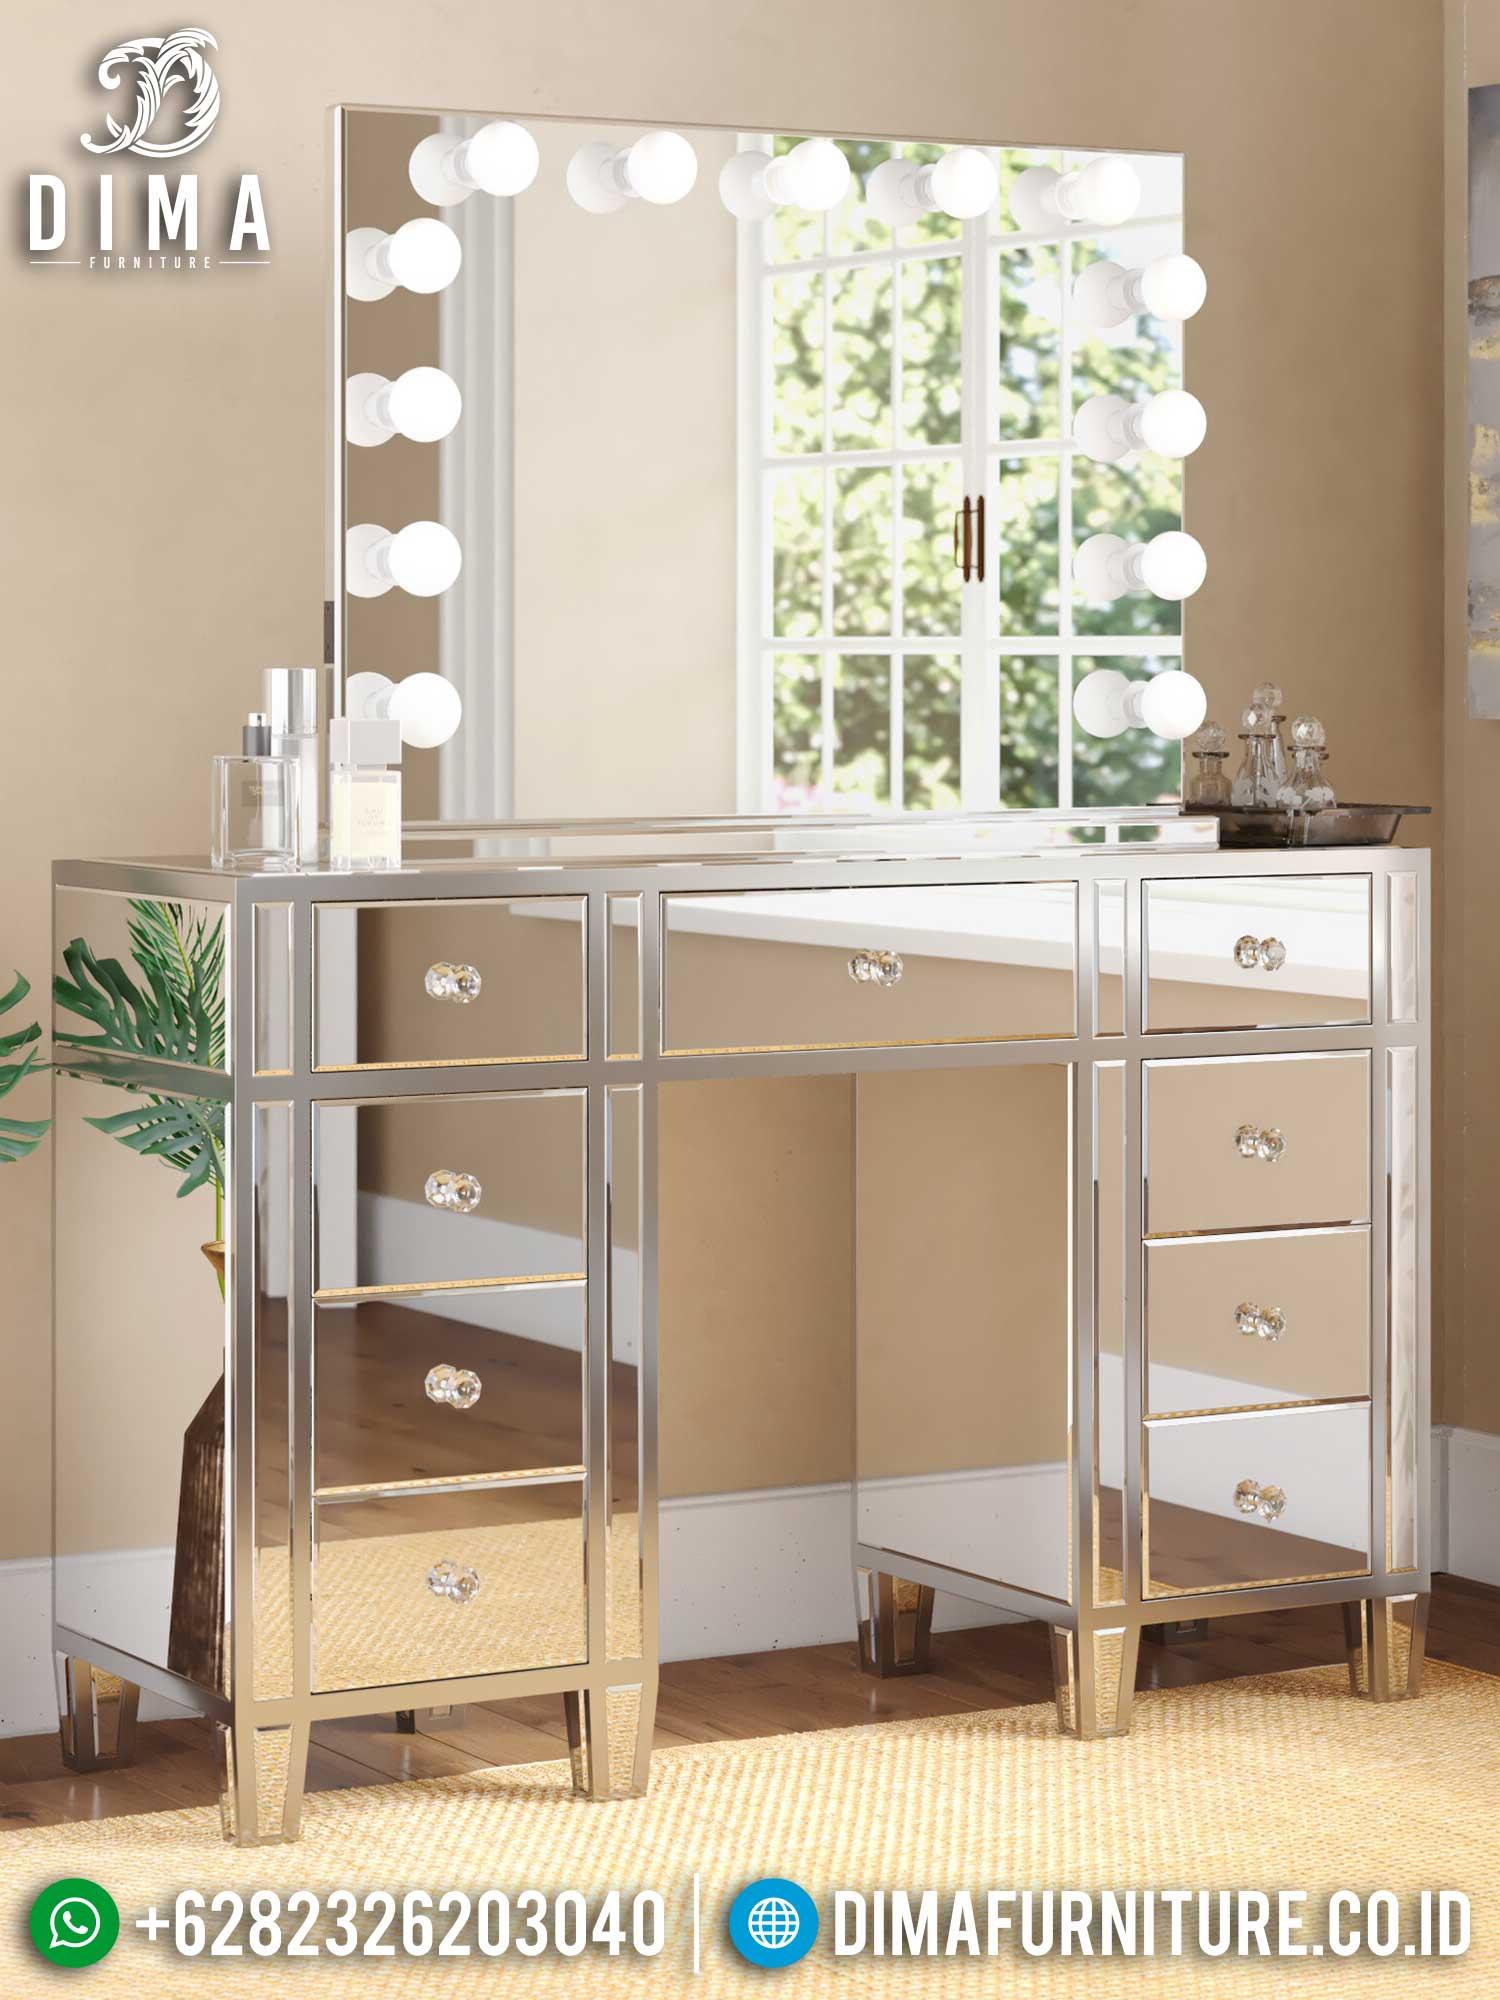 Meja Rias Minimalis Cantik Simple Modern Design Full Kaca Lampu TTJ-1415